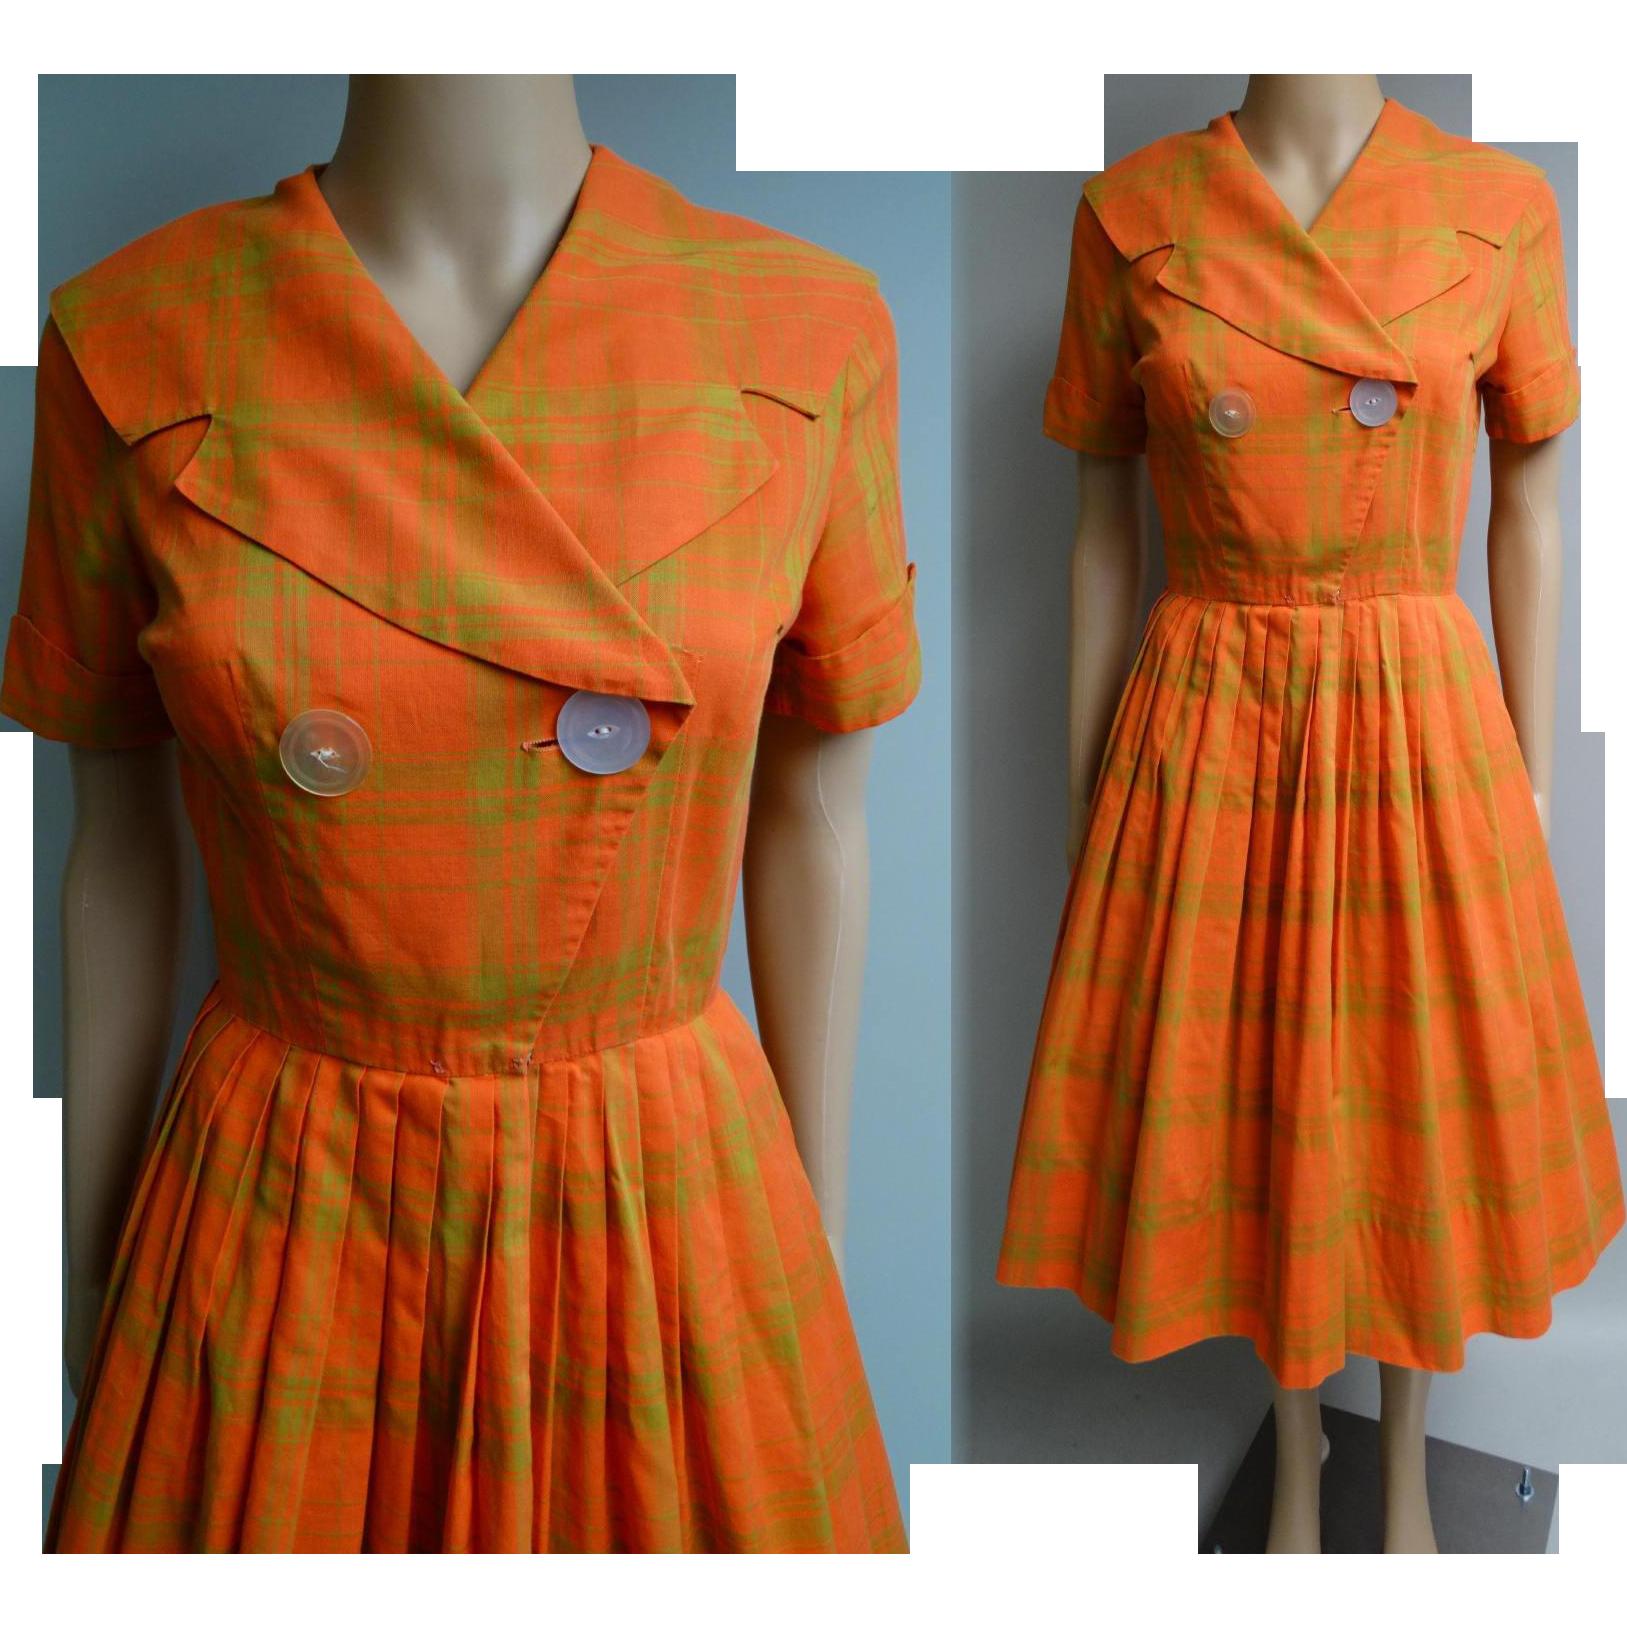 Vintage 1950s Dress Orange Dress Shawl Collar Dress